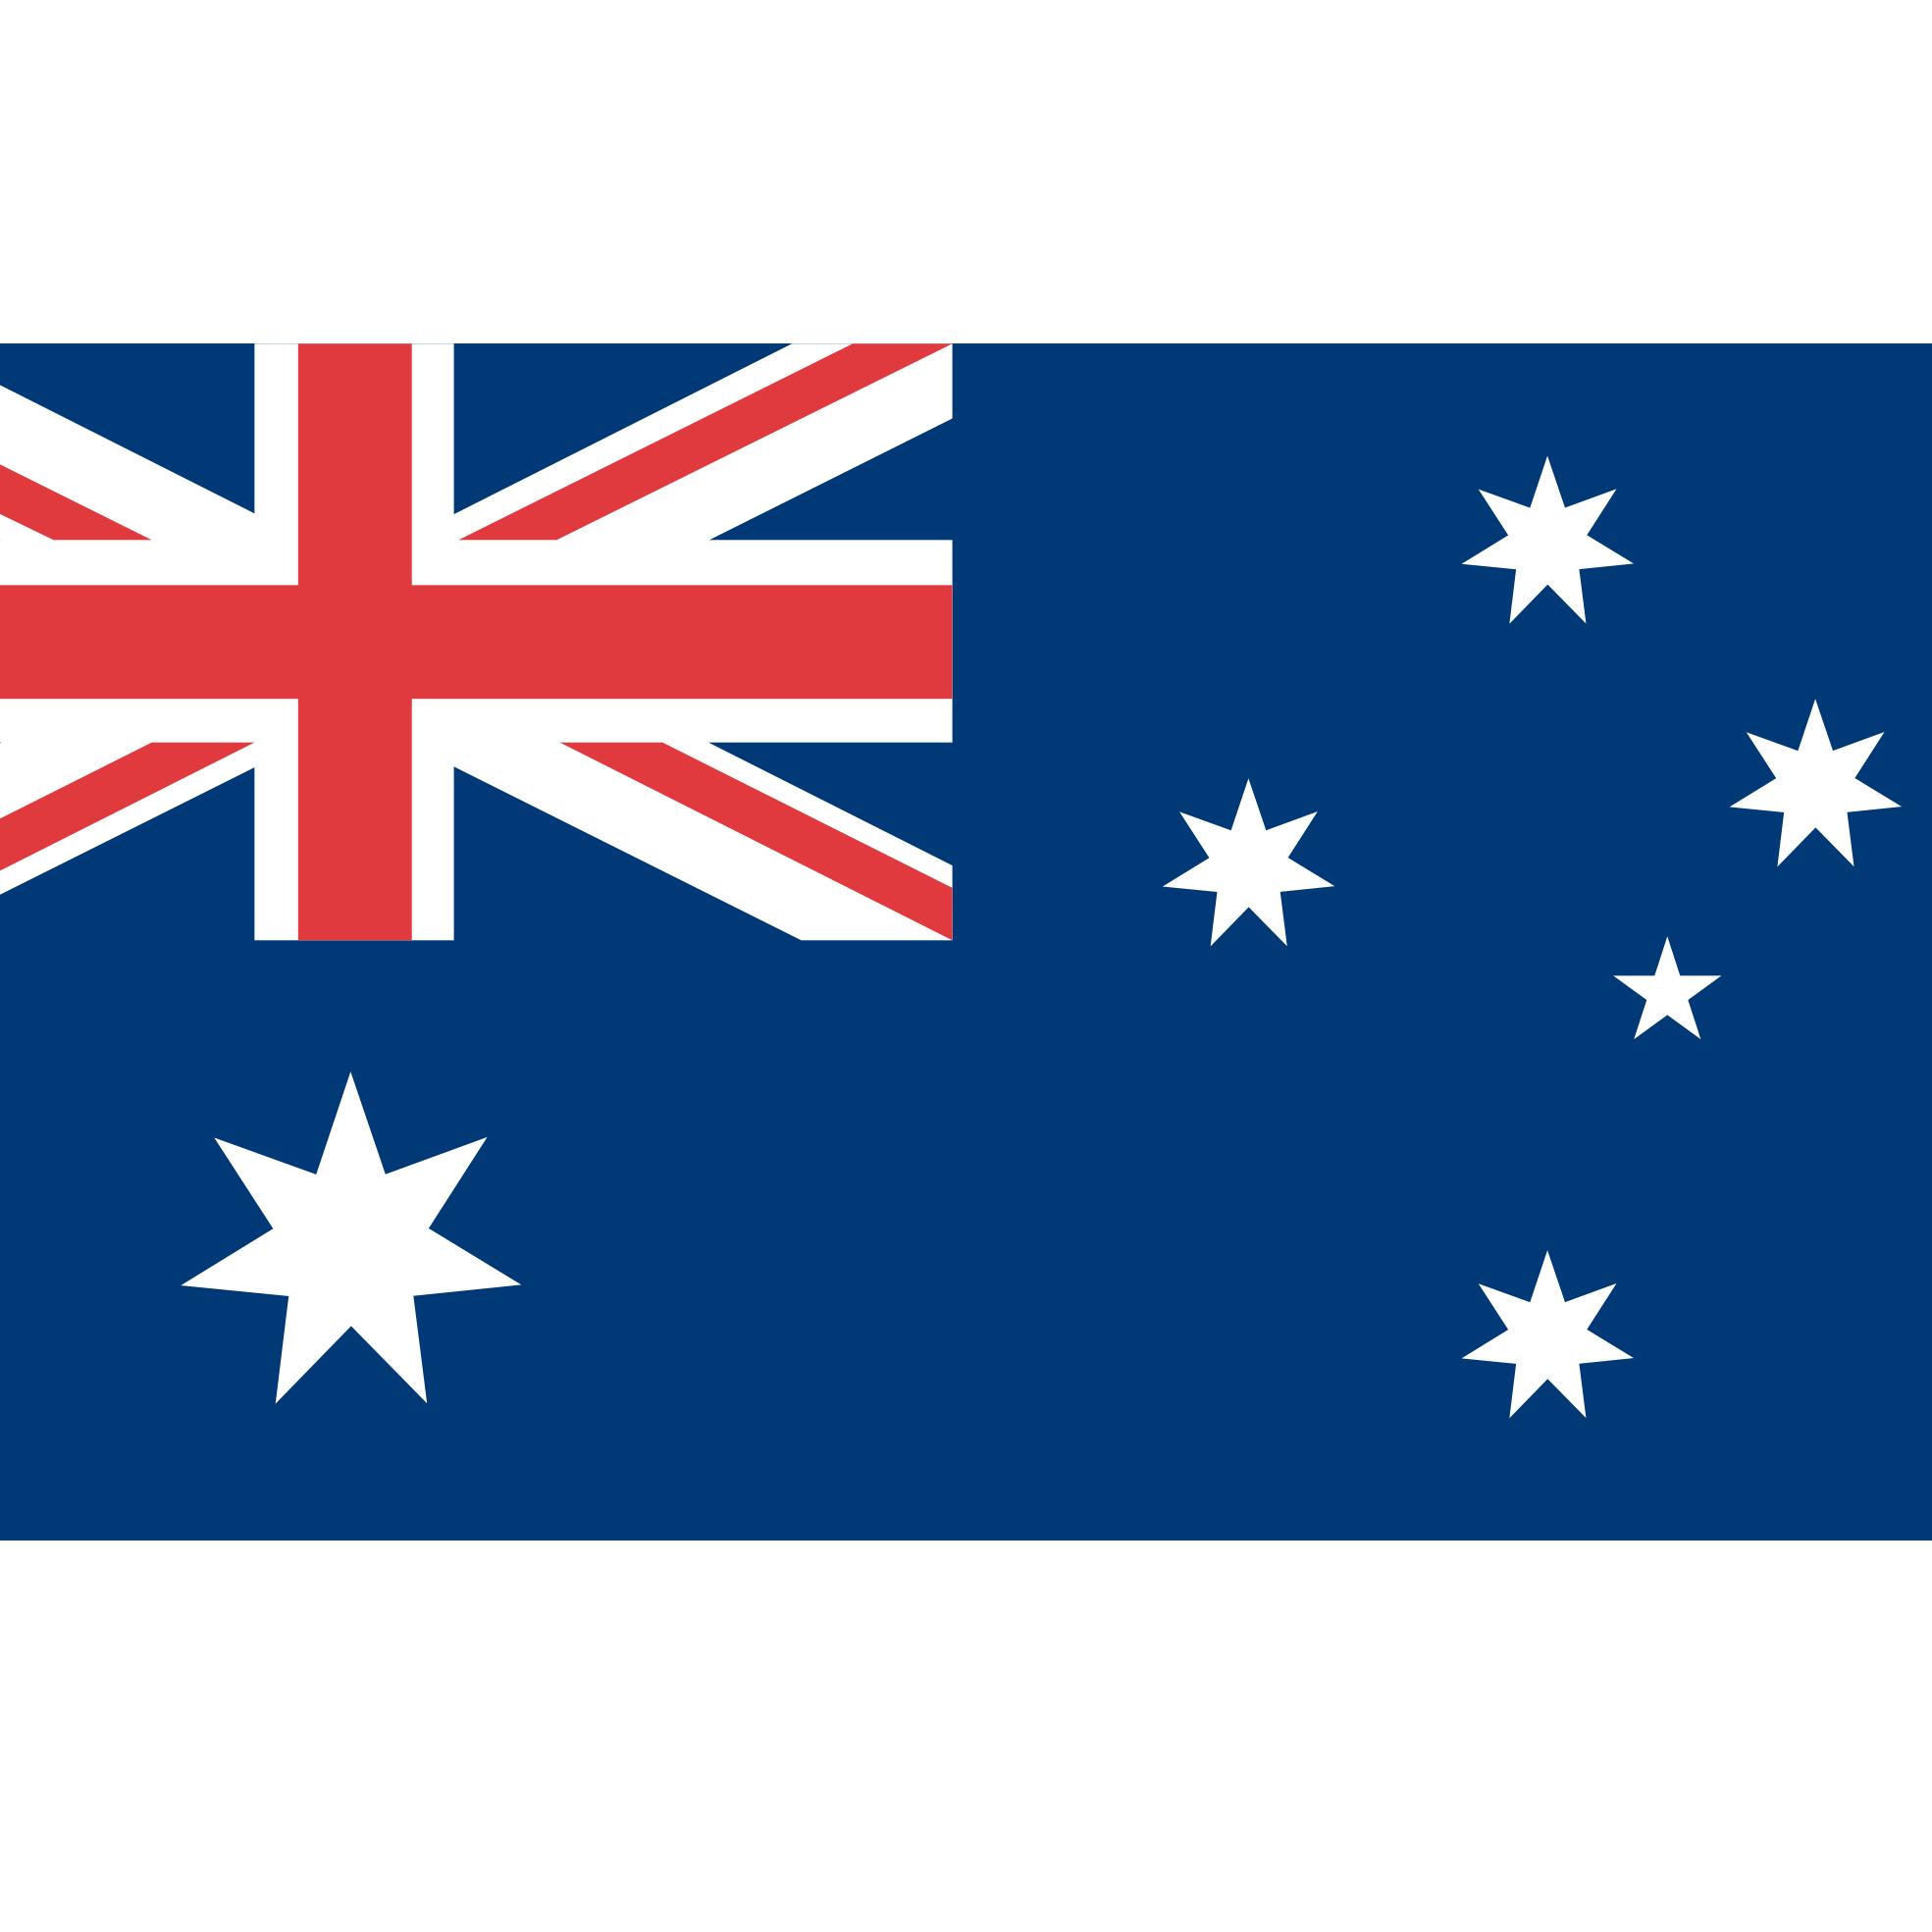 Australian clipart #1, Download drawings